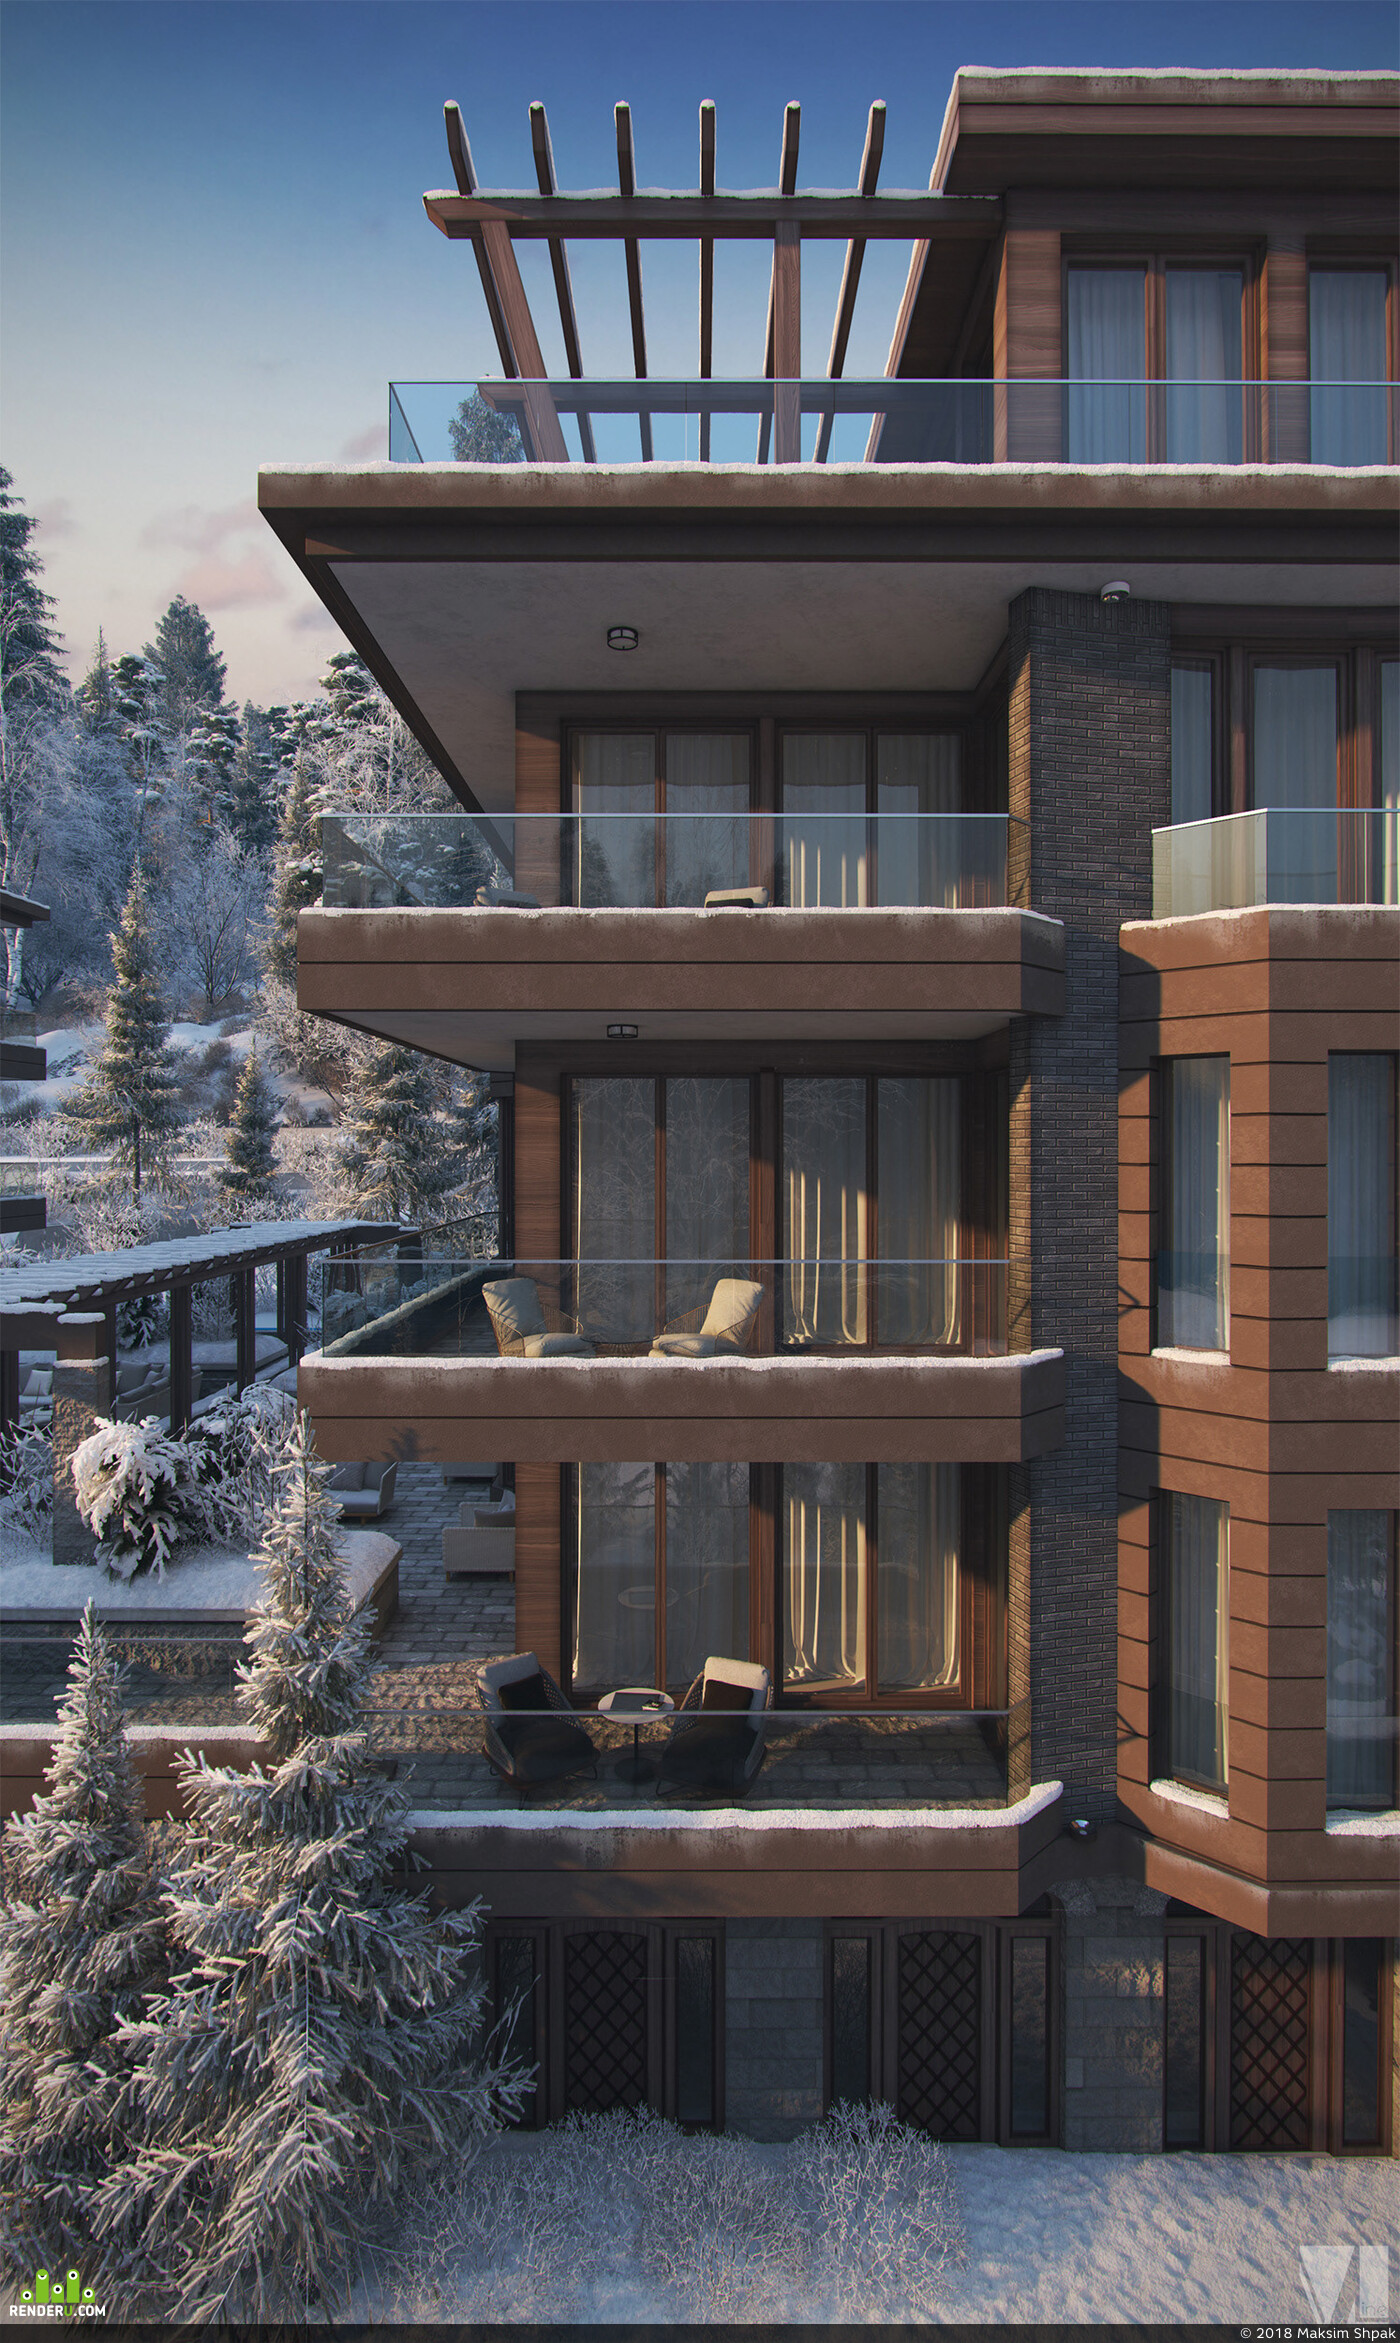 exterior., interior interior design design 3D 3D Studio Max 3D архитектура интерьер дизайн интерьера интерьер, visualization, visualization, vizlinestudio, 3Dsmax